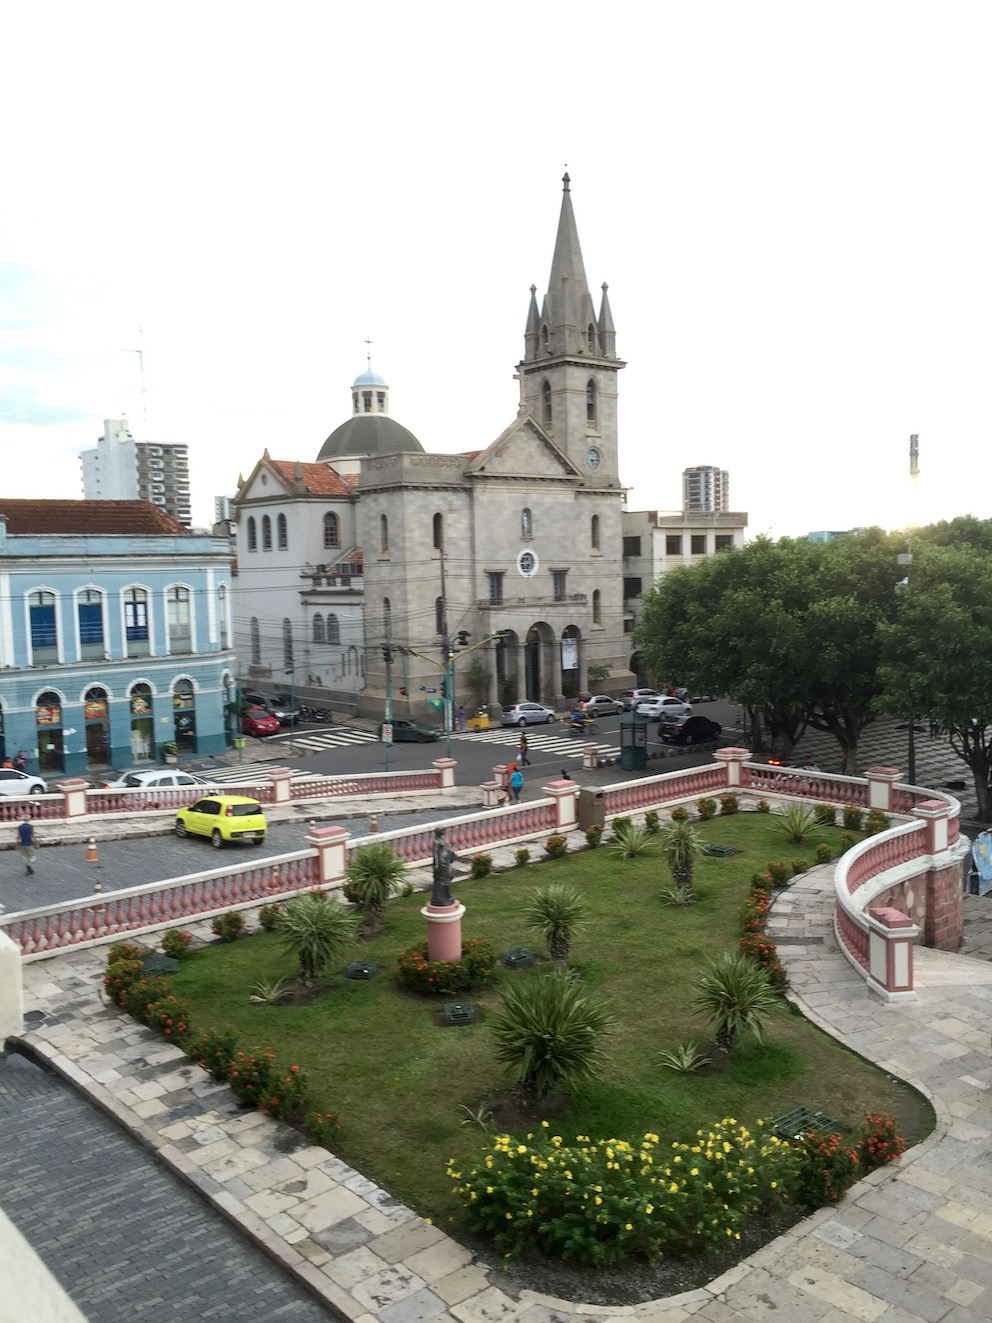 City center, manaus